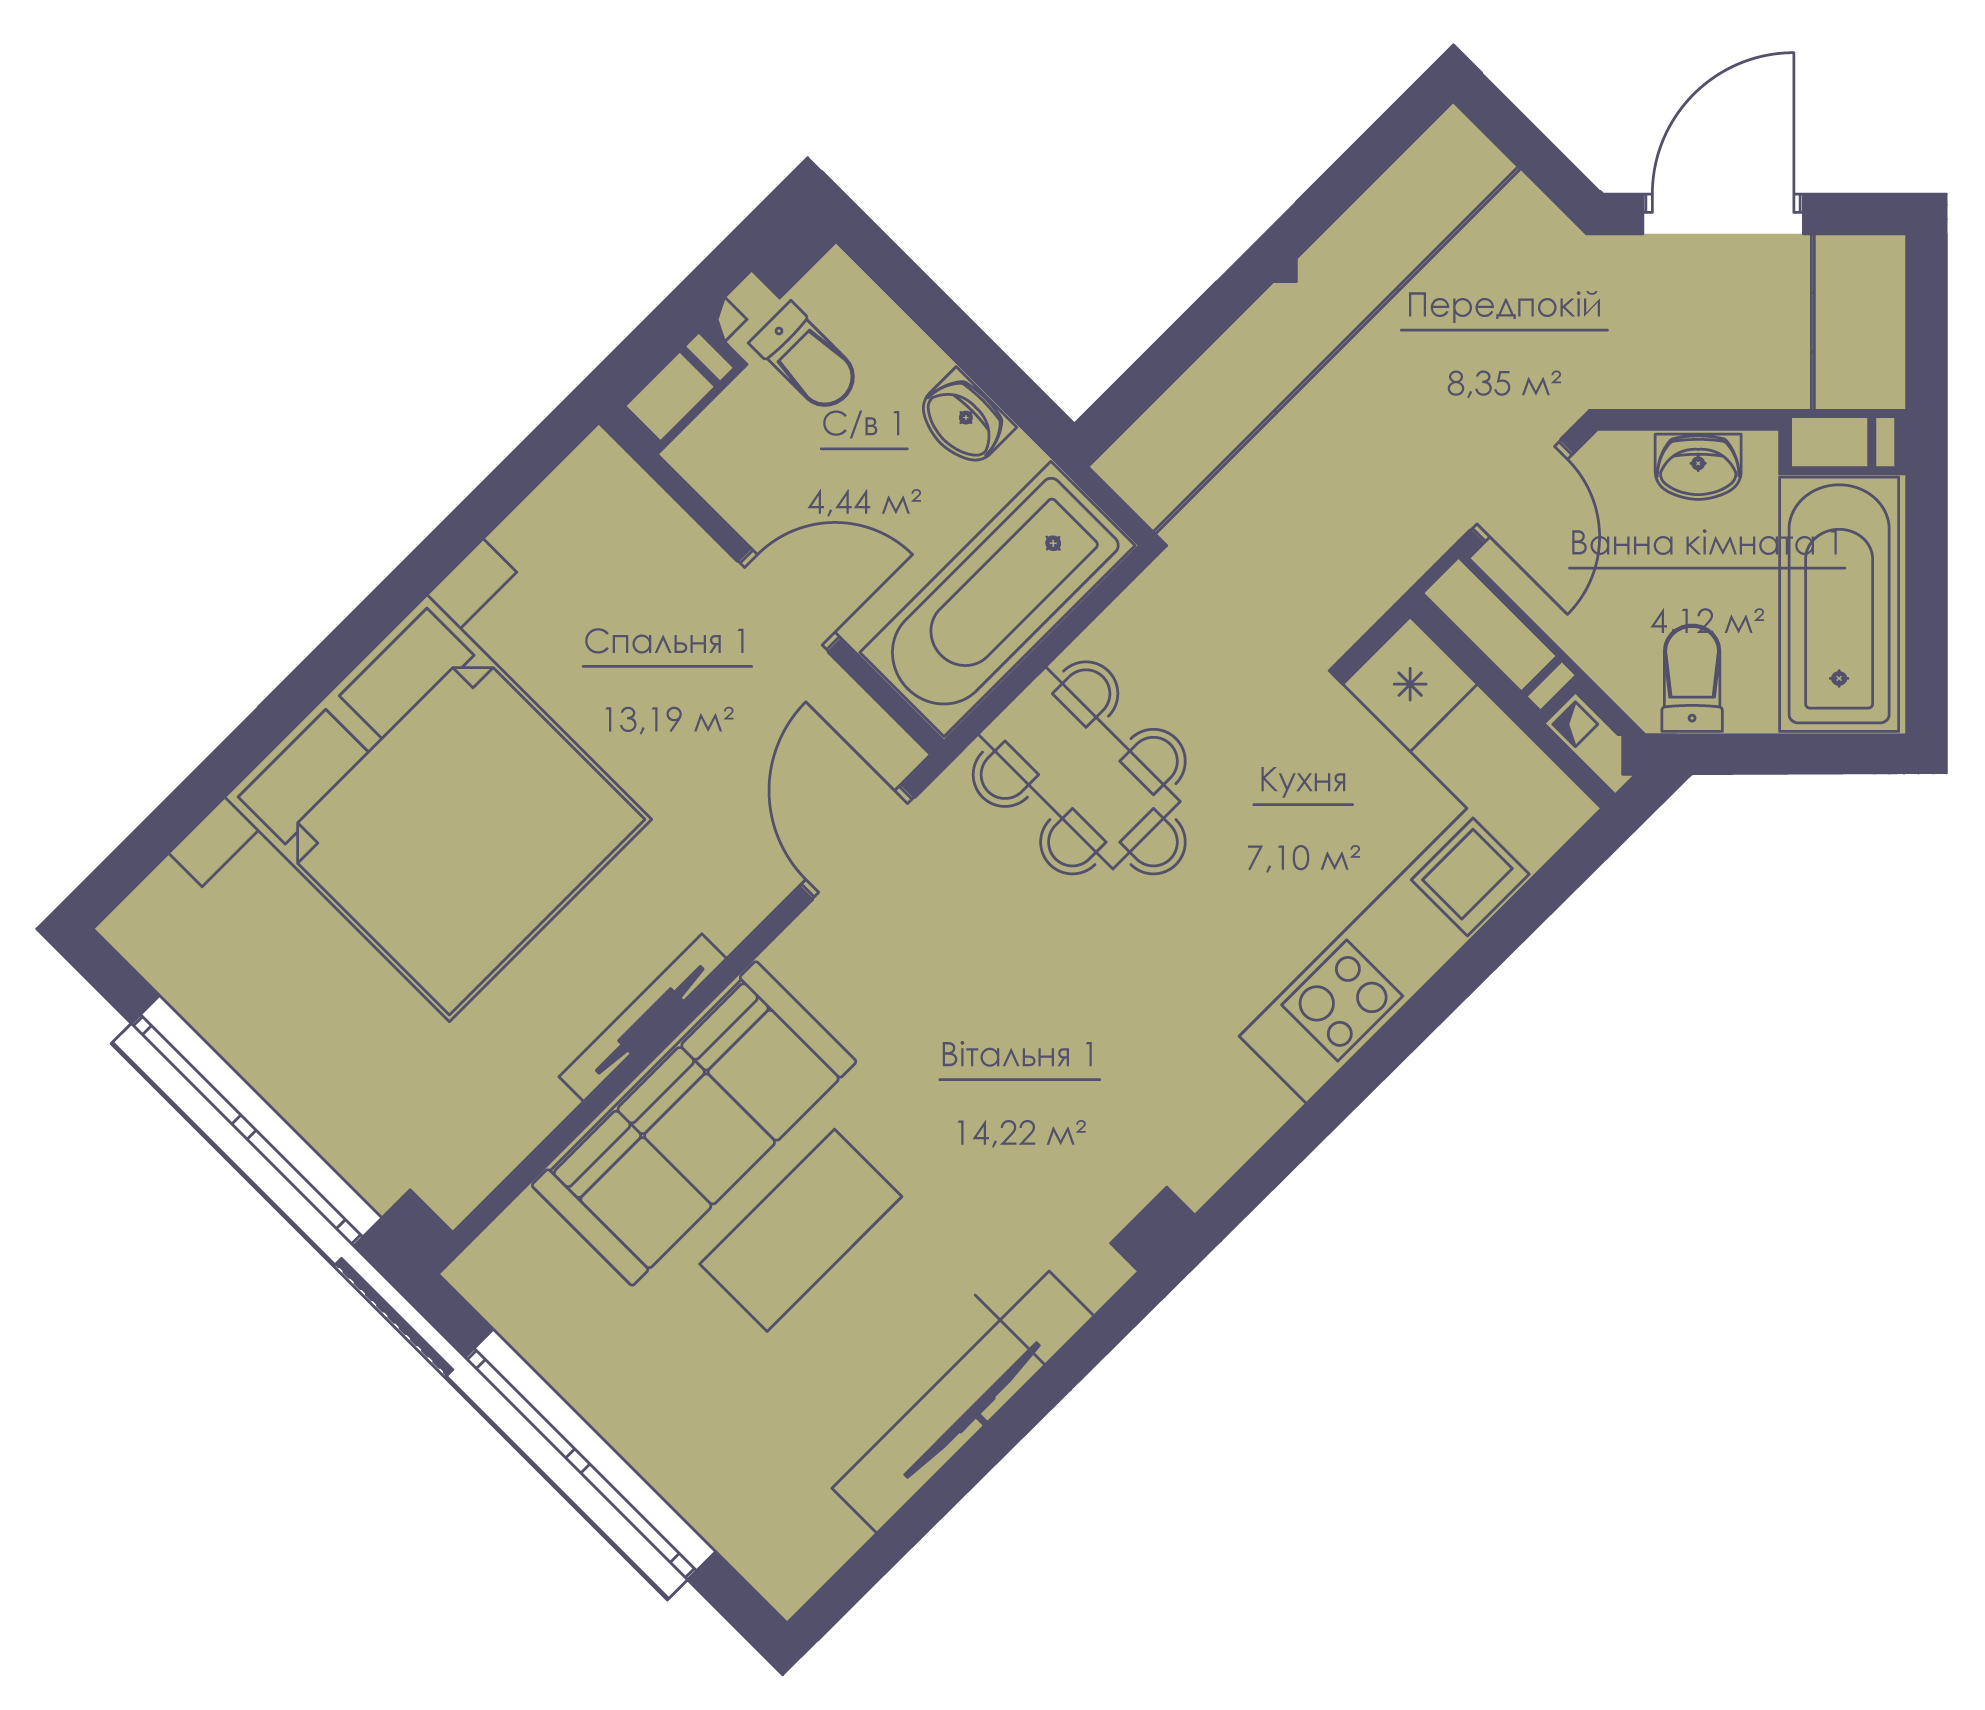 Apartment layout KV_60_2m_1_1_3-1